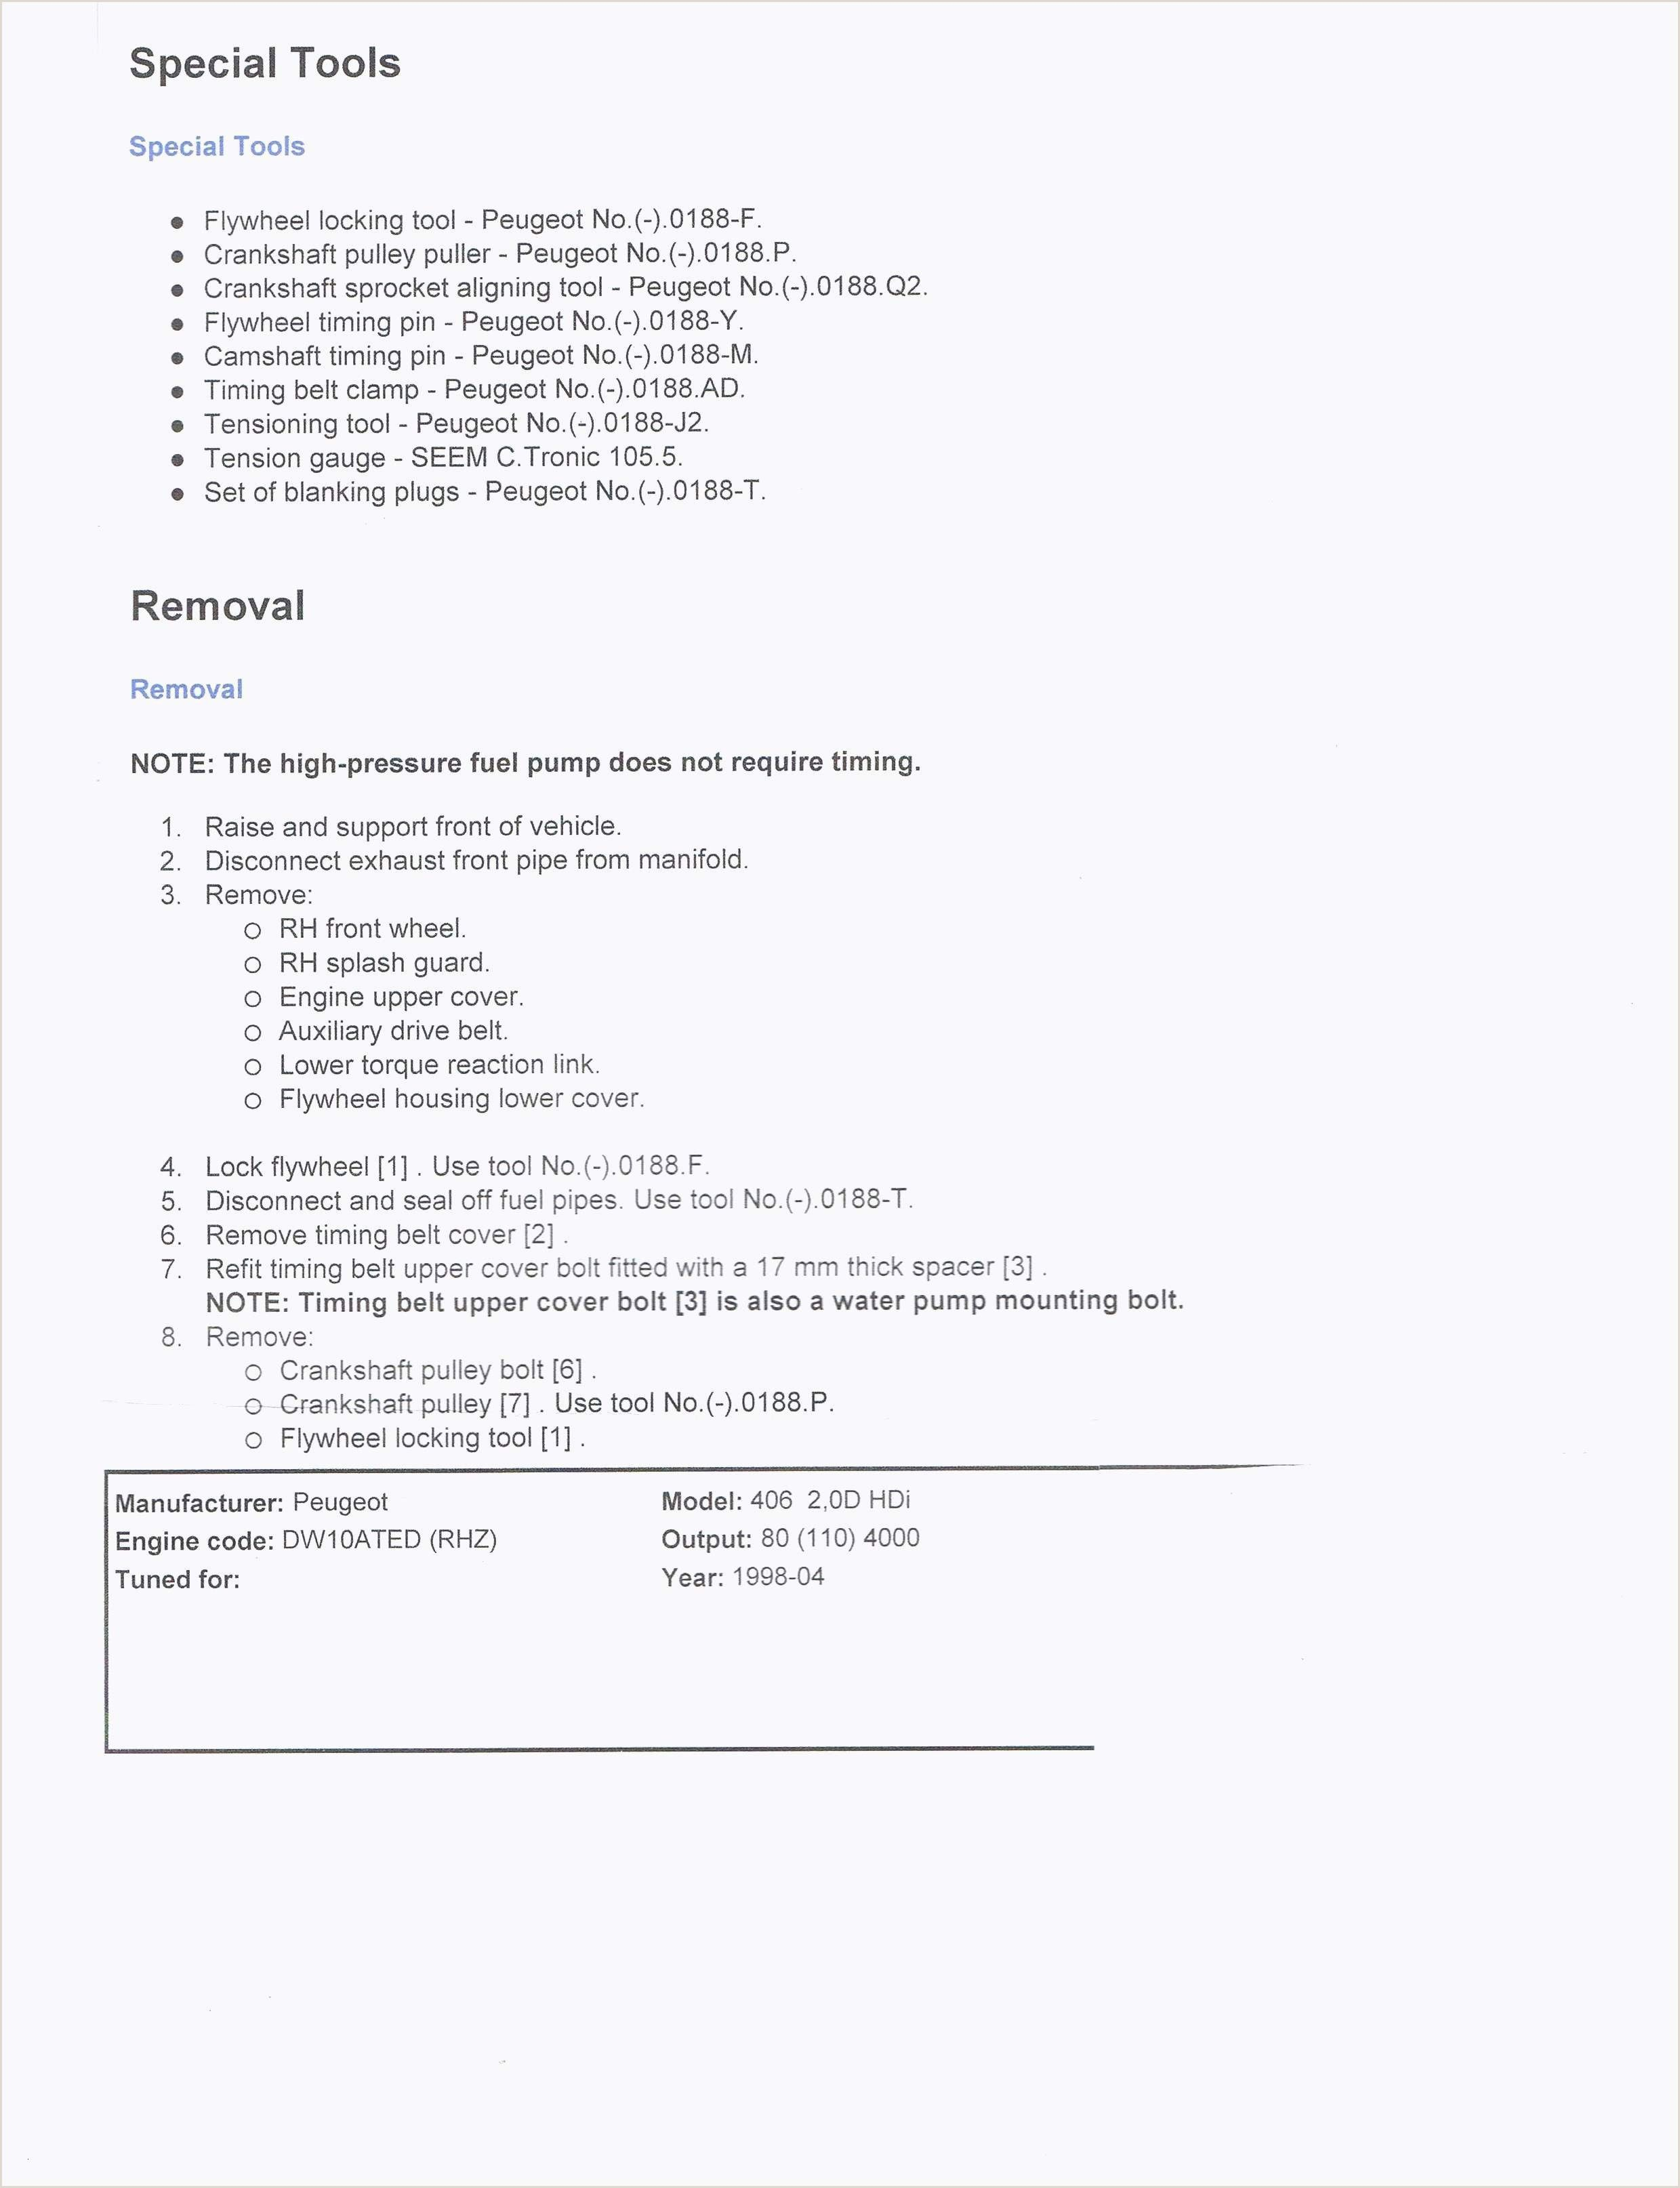 Lebenslauf Muster Ausbildung Lebenslauf Muster Ausbildung Lebenslauf Muster Ausbildung Mod Le Courr In 2020 Resume Template Resume Template Examples Student Resume